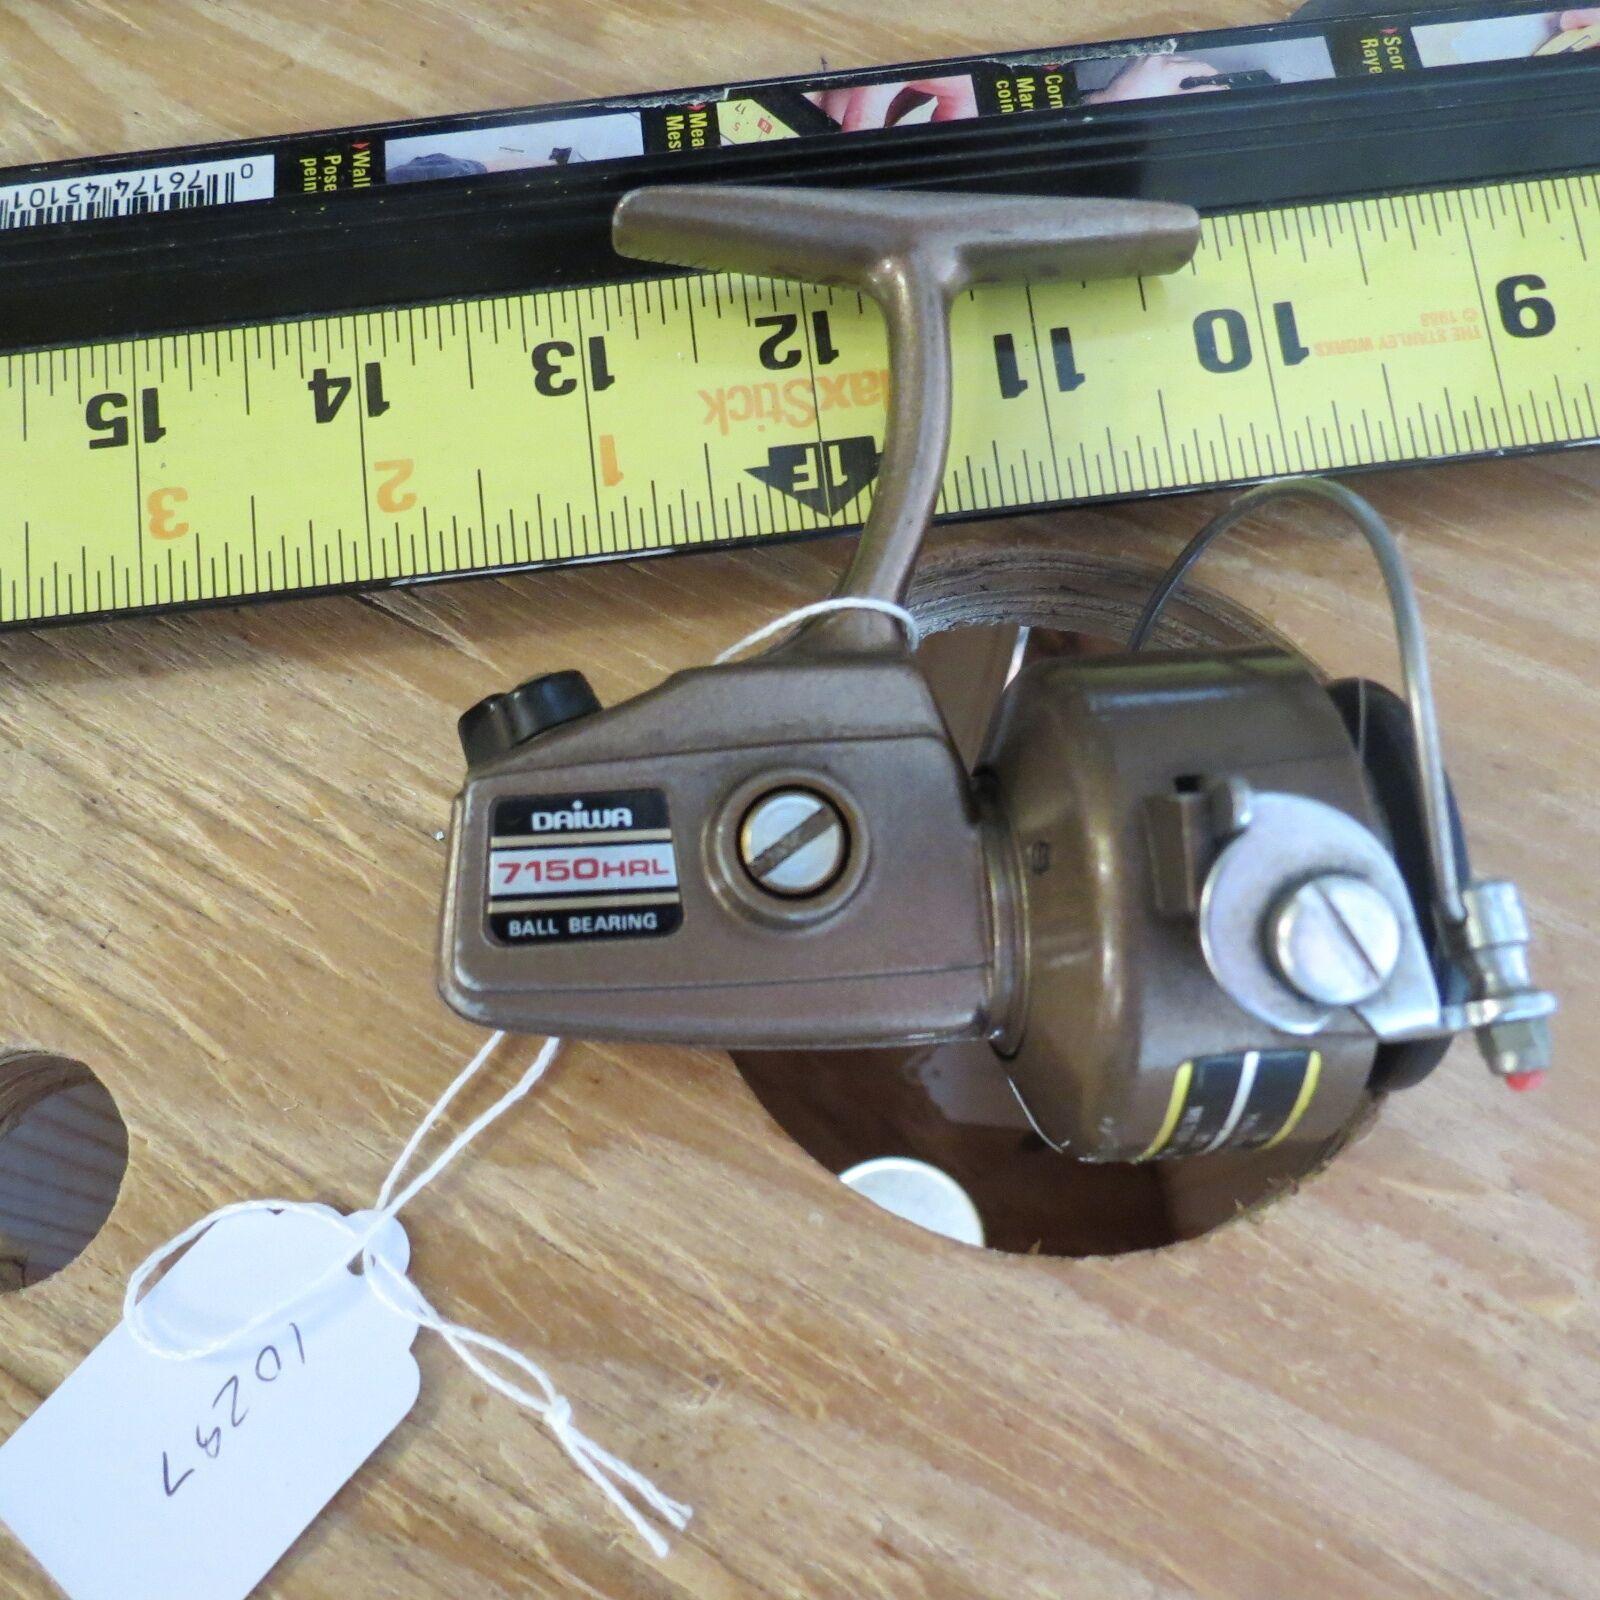 Daiwa 7150 HRL Trout fishing reel (lot)